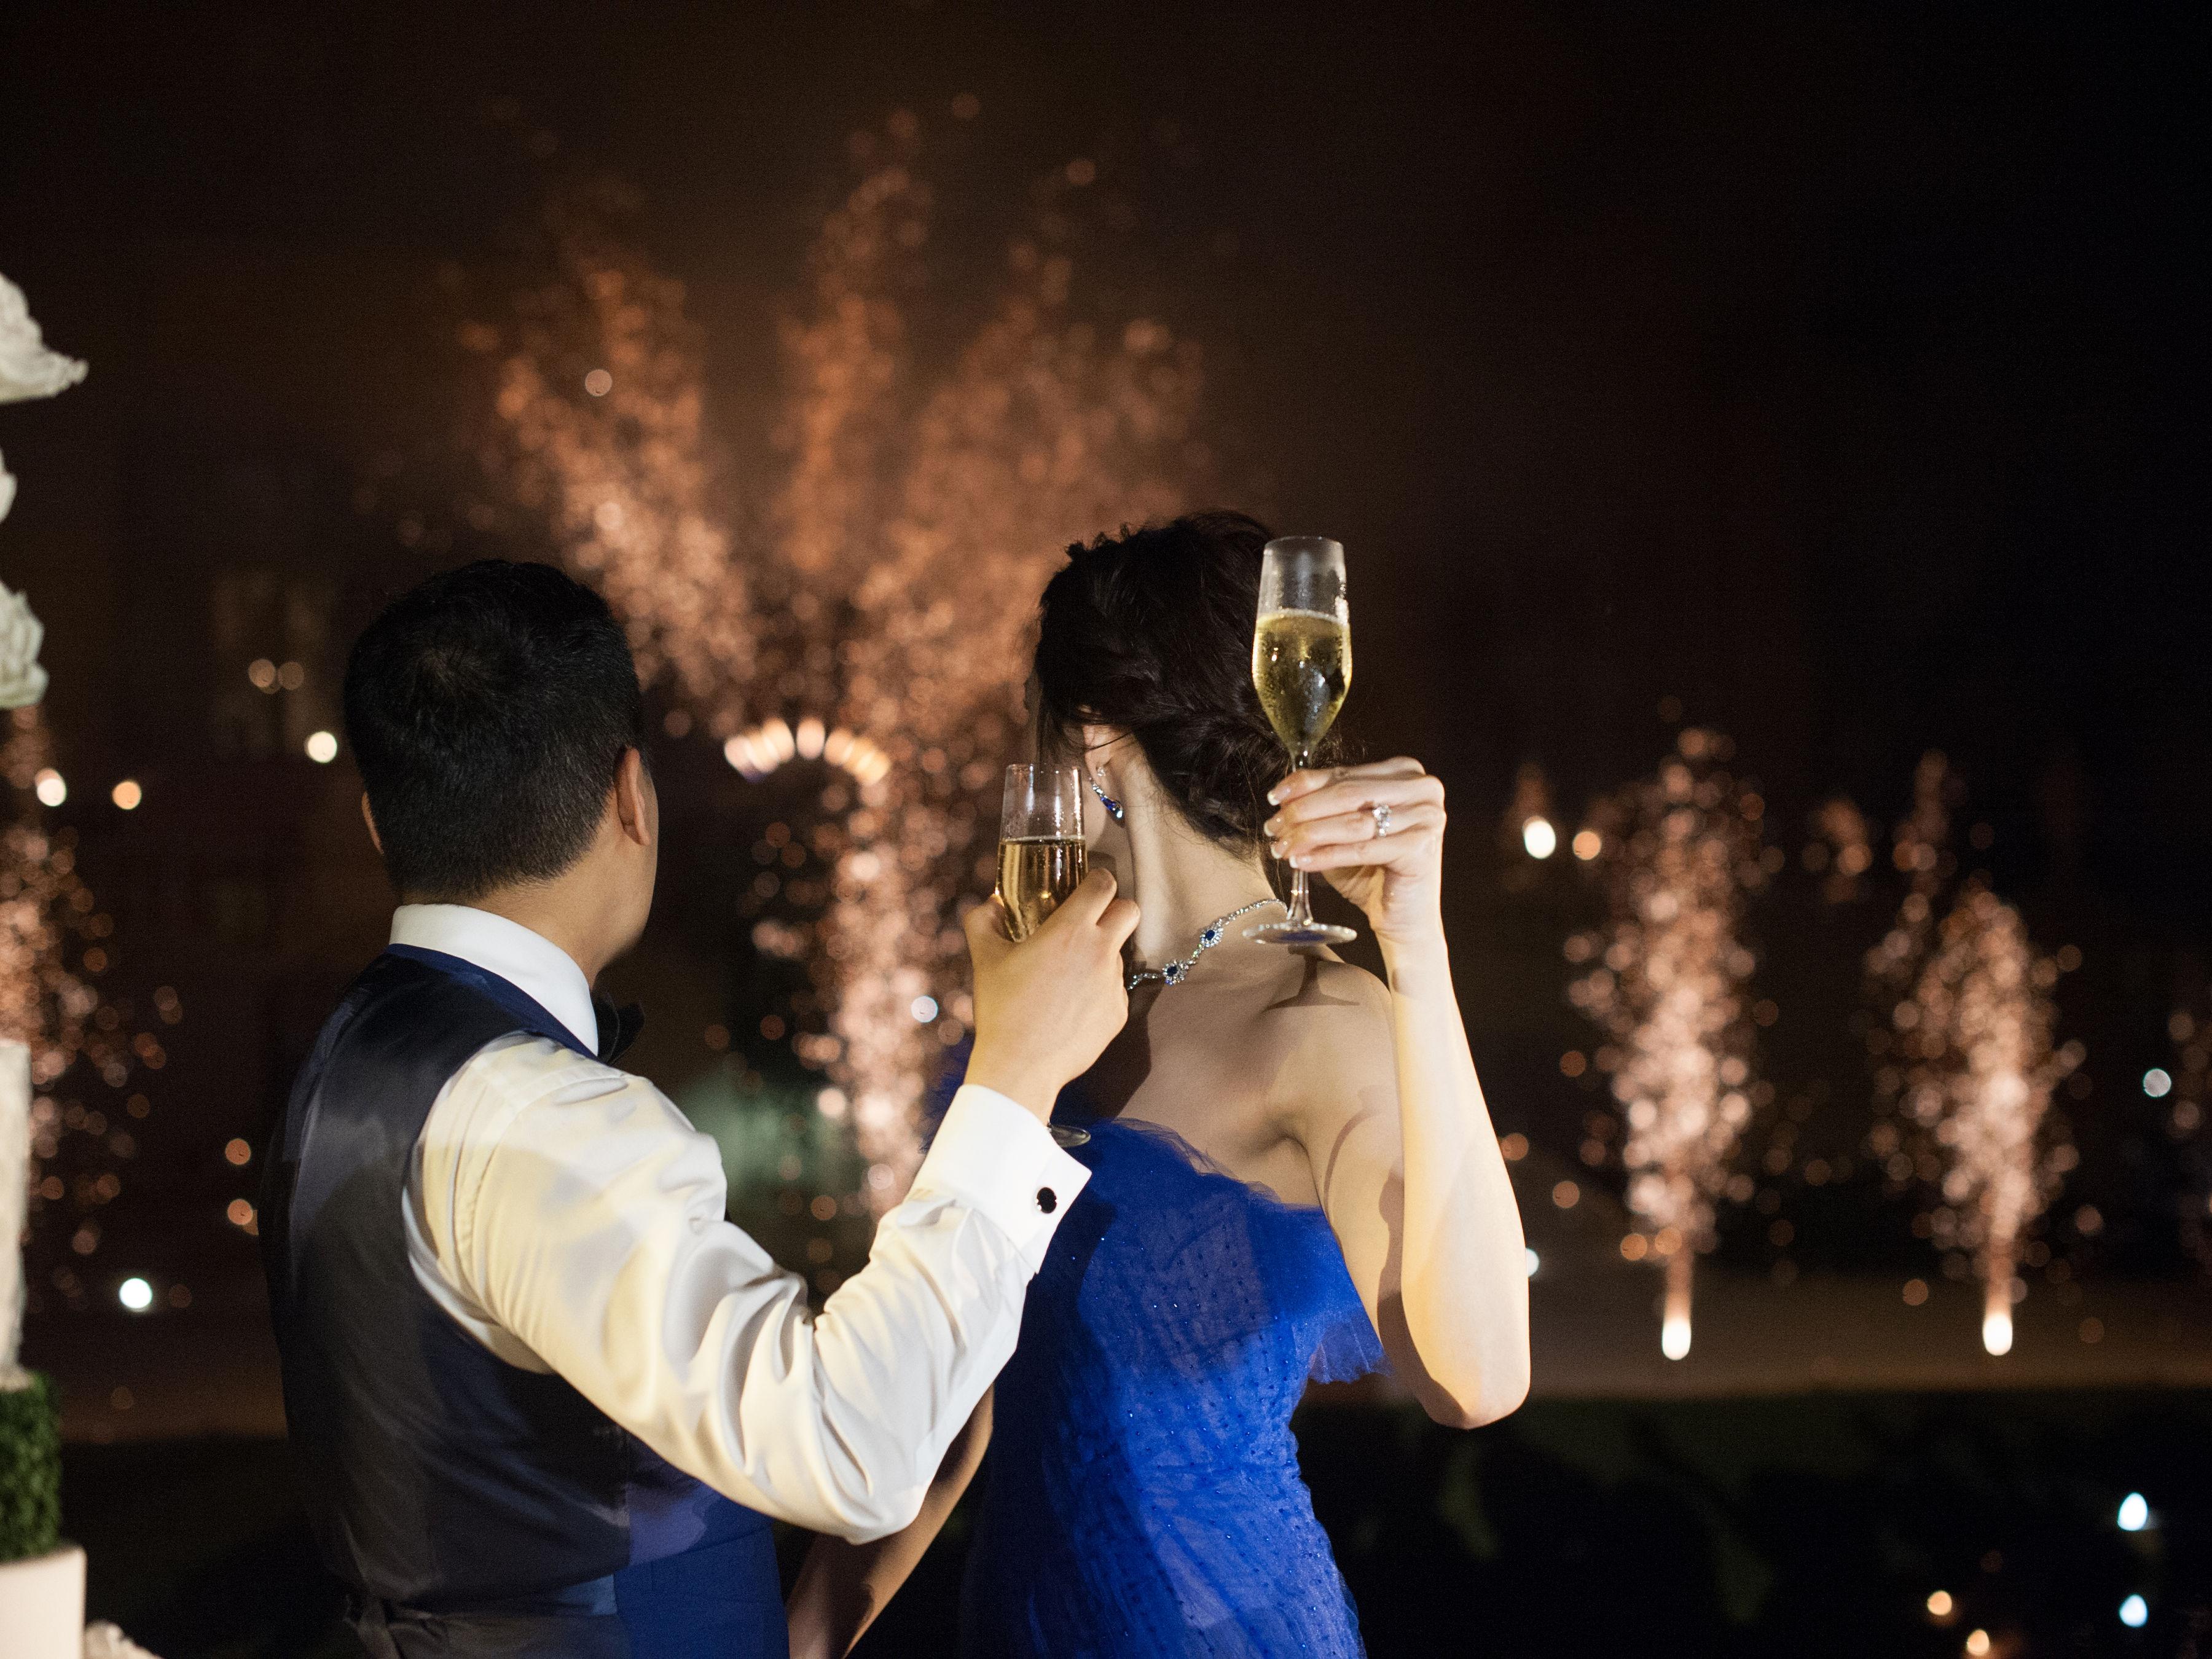 janet patrick wedding fireworks couple